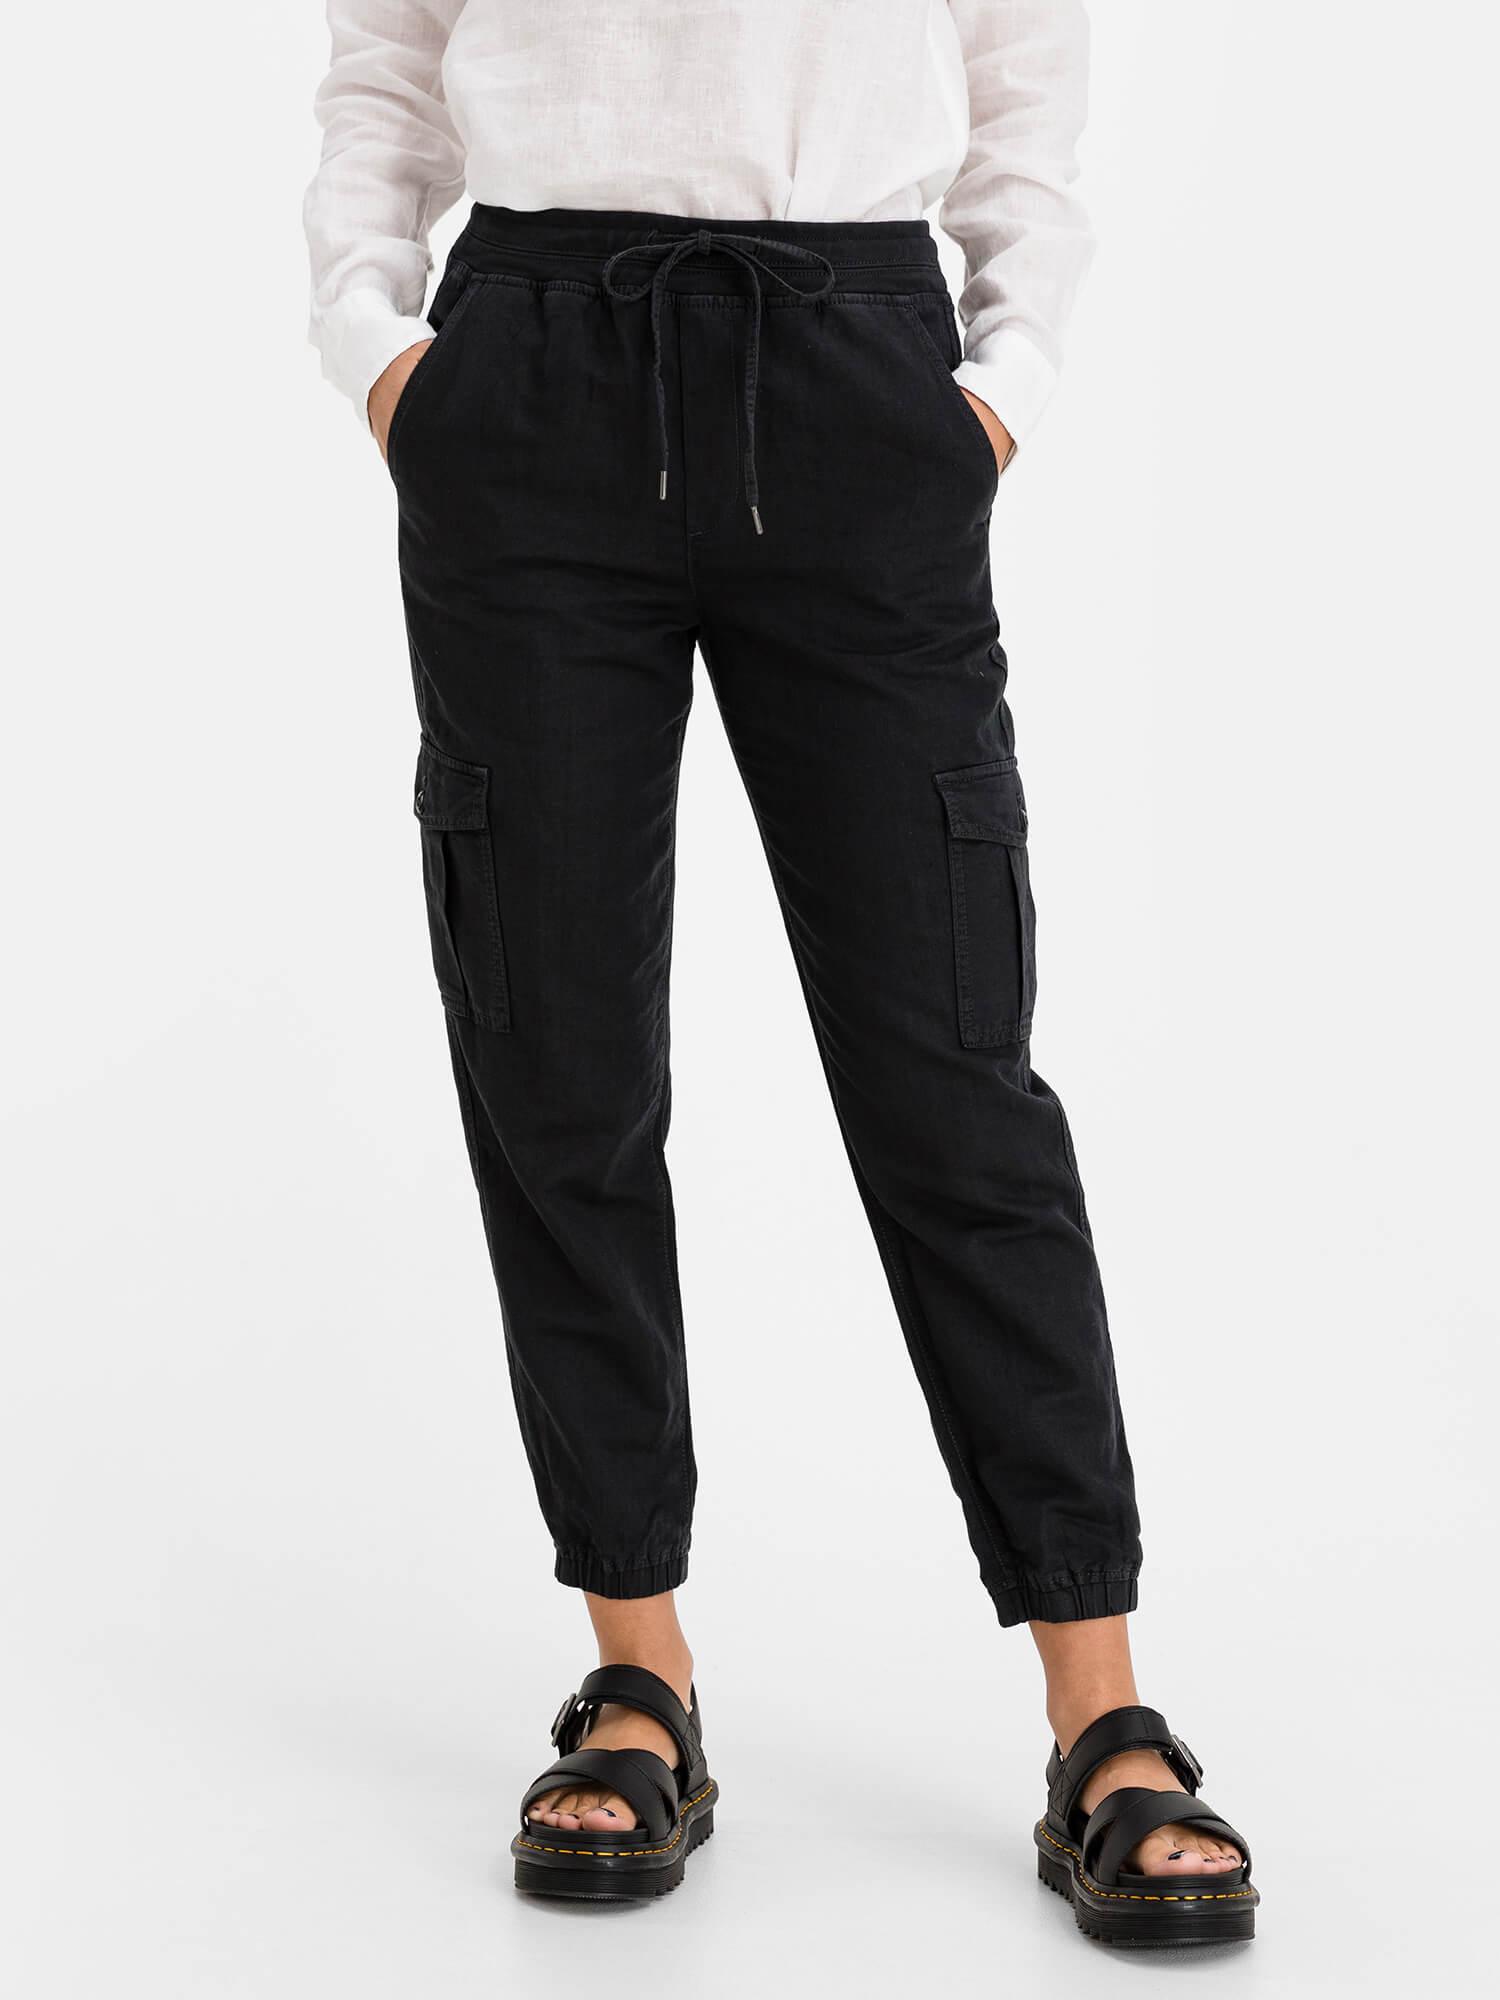 GAP čierne nohavice s kapsami - XL